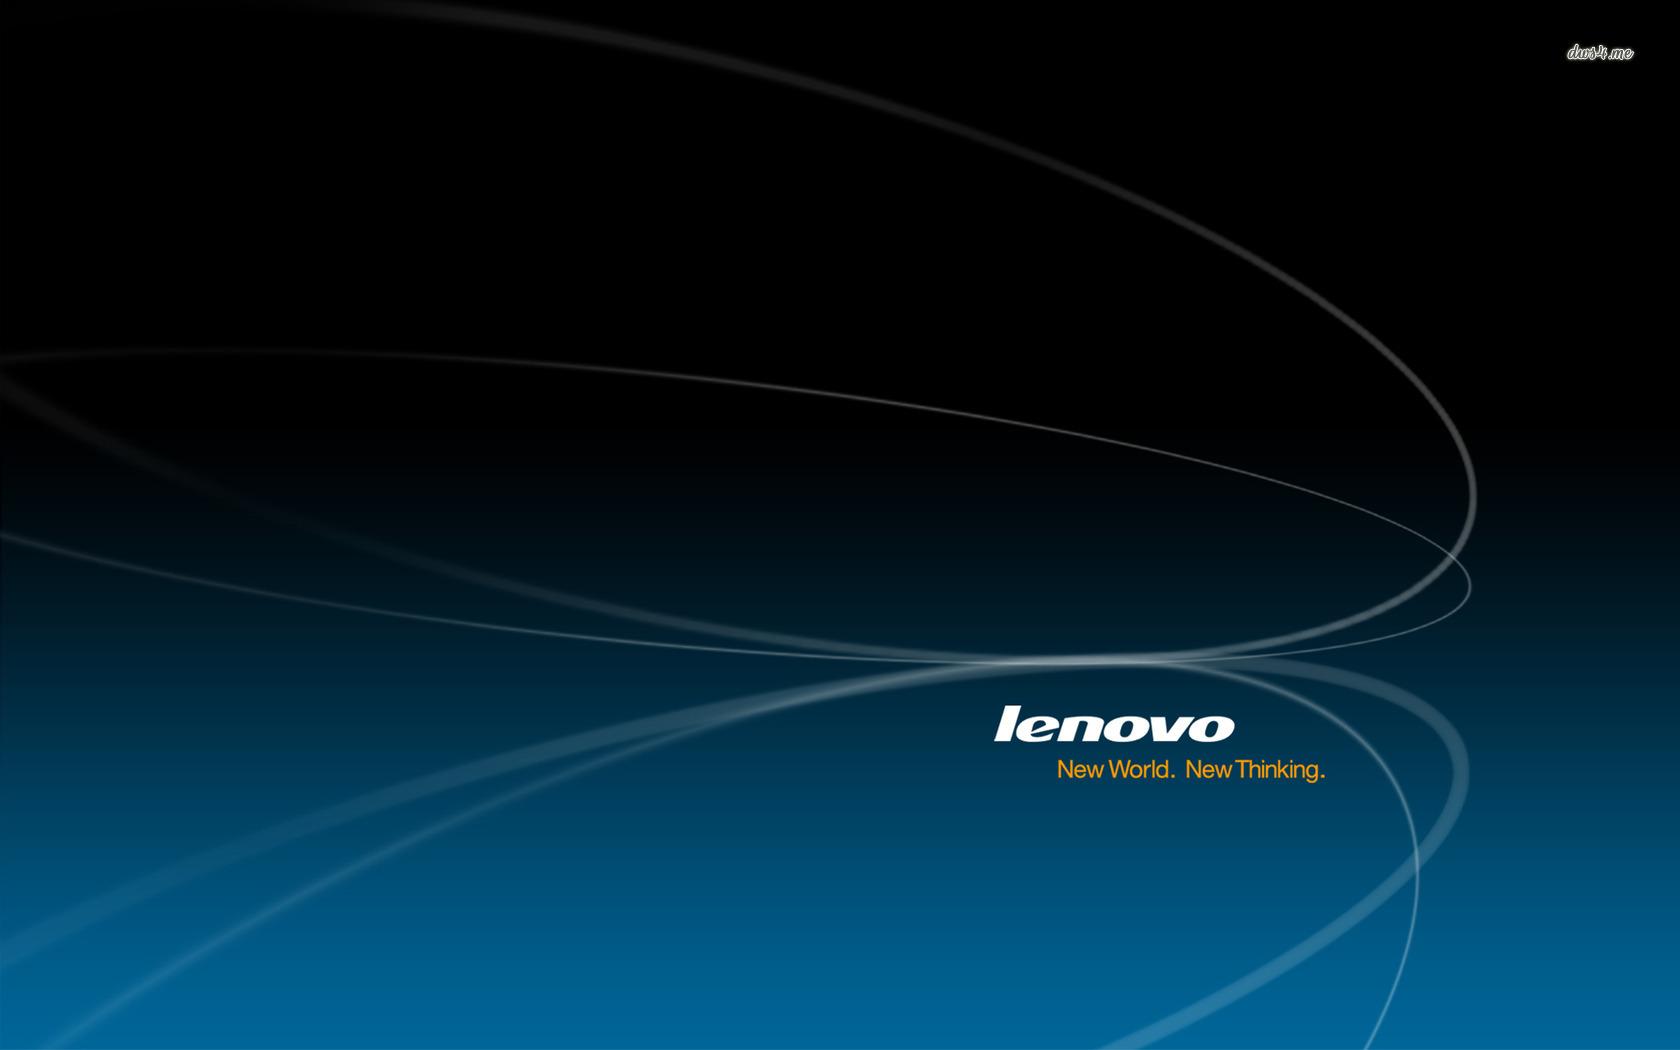 Lenovo wallpaper   Computer wallpapers   3922 1680x1050